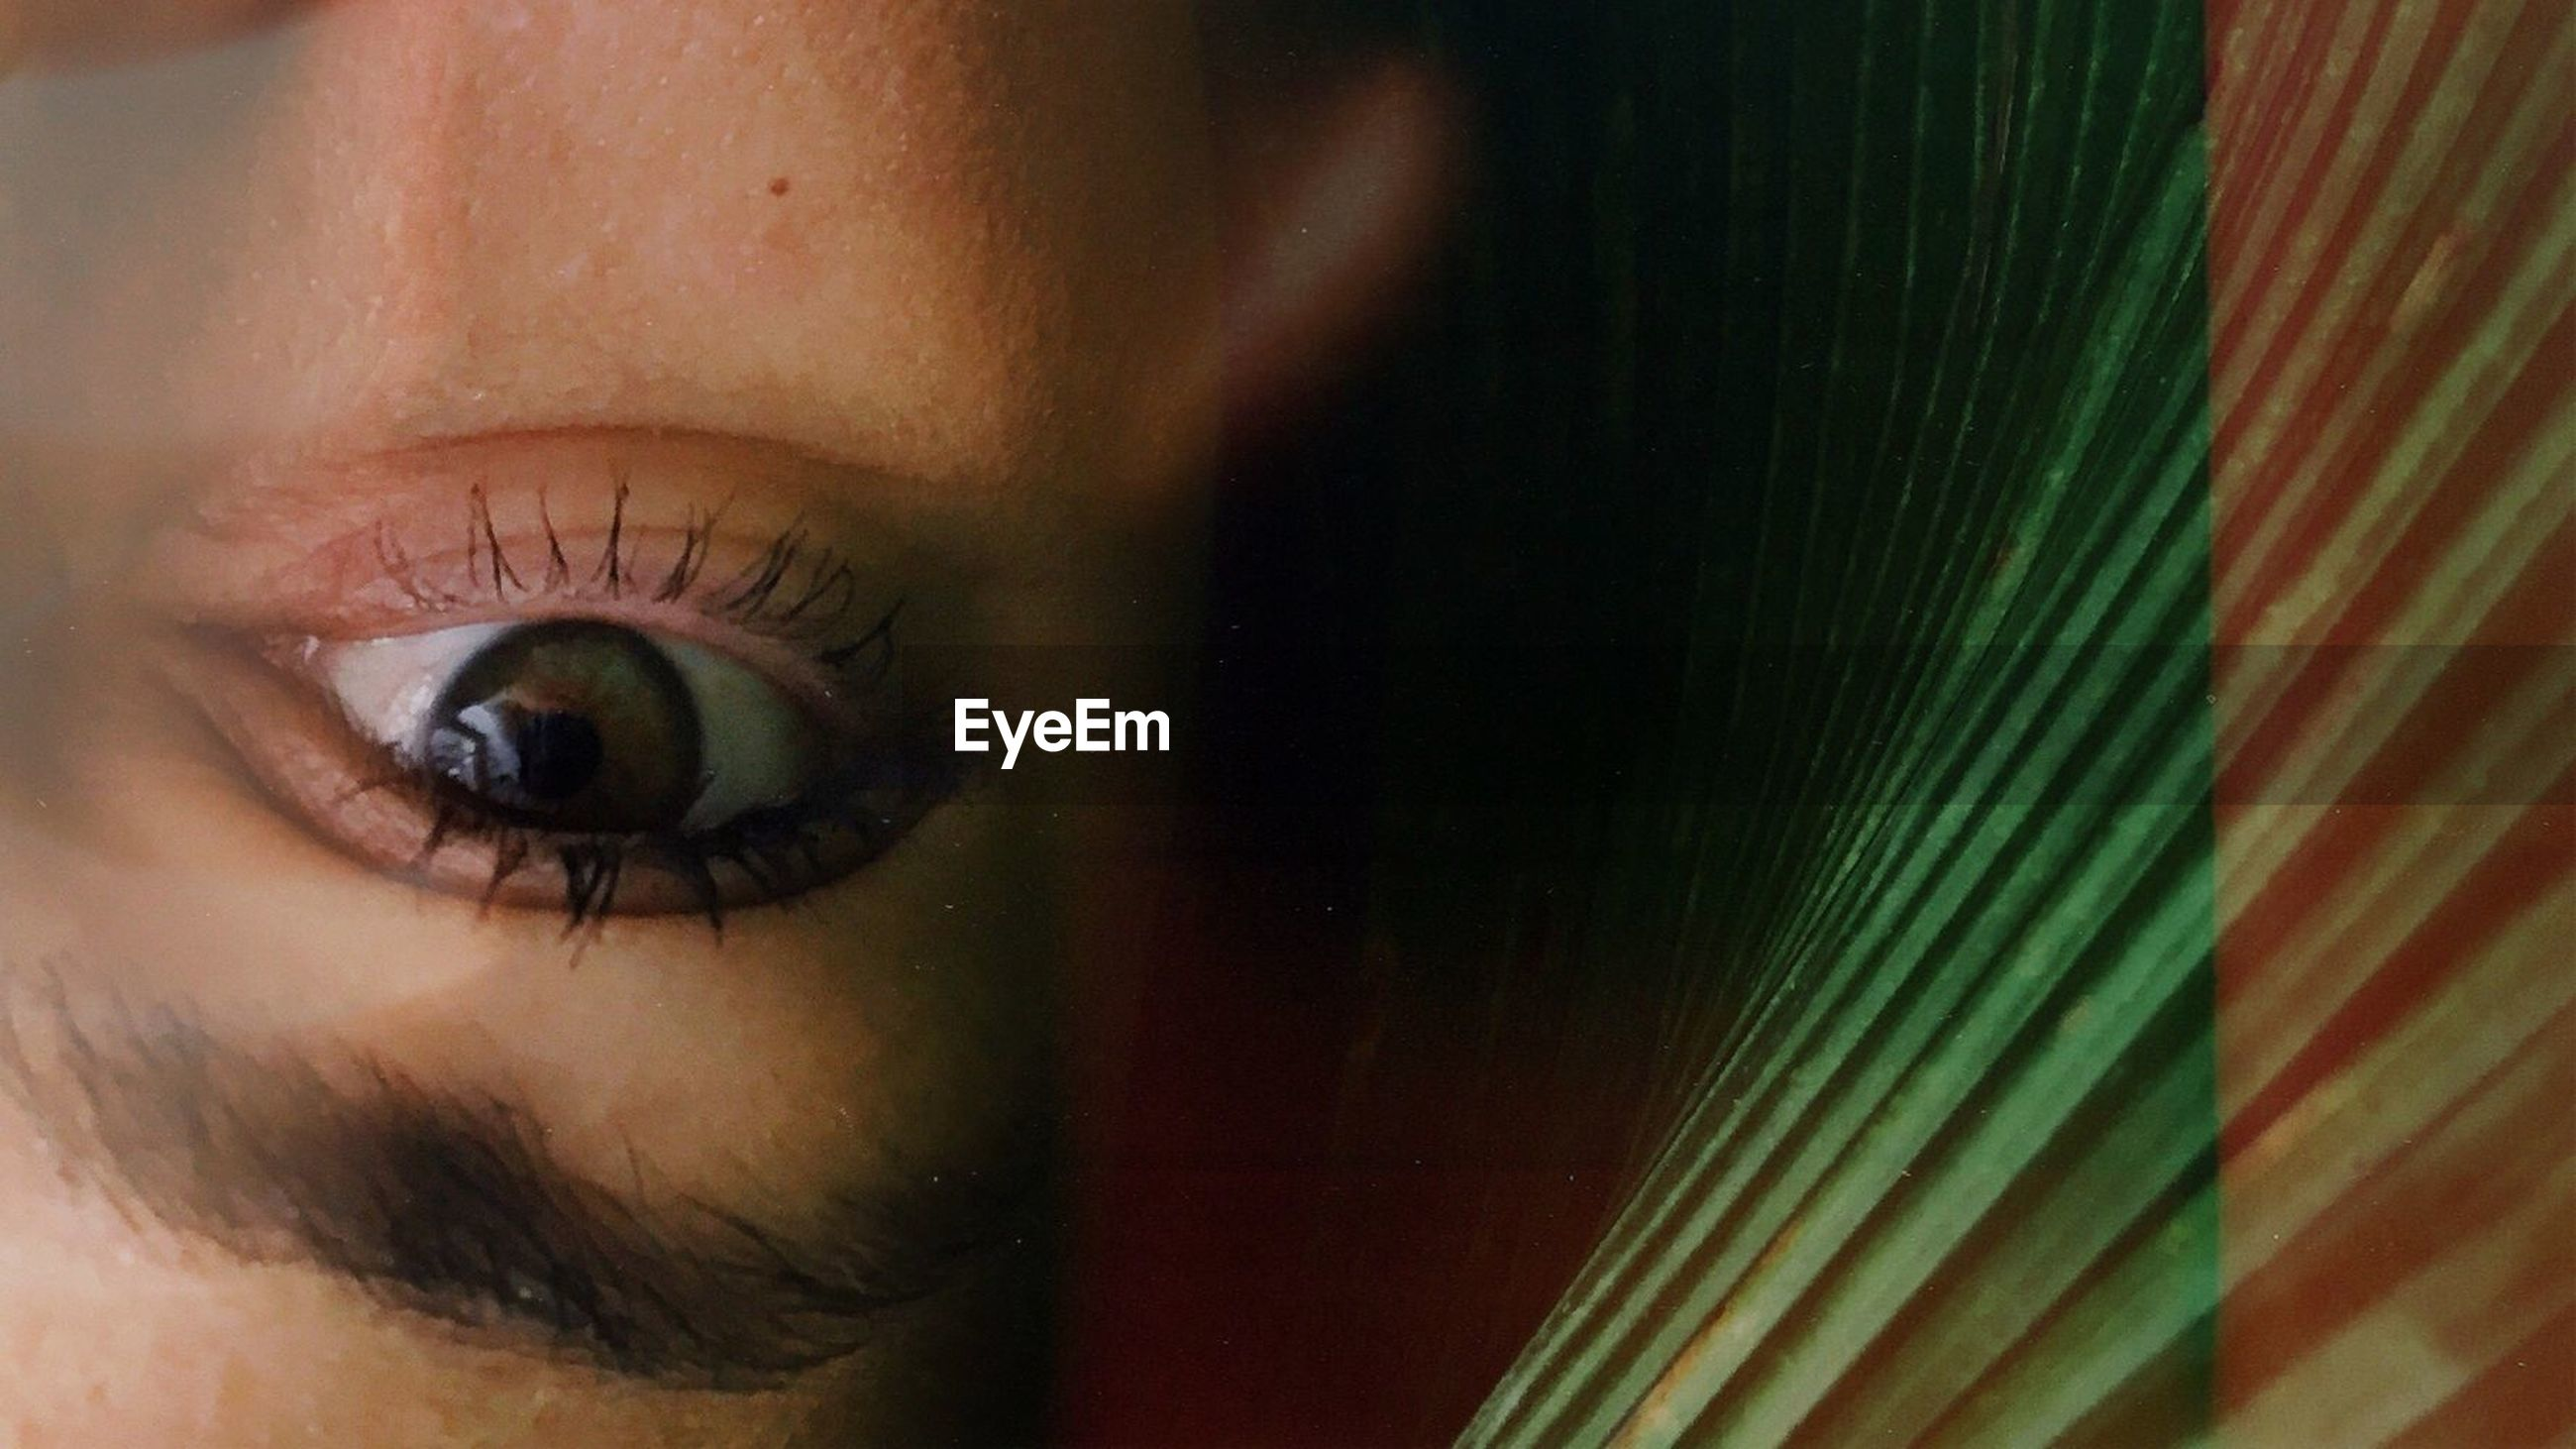 human eye, one person, eyelash, close-up, sensory perception, human body part, looking at camera, real people, eyeball, eyesight, young adult, indoors, day, people